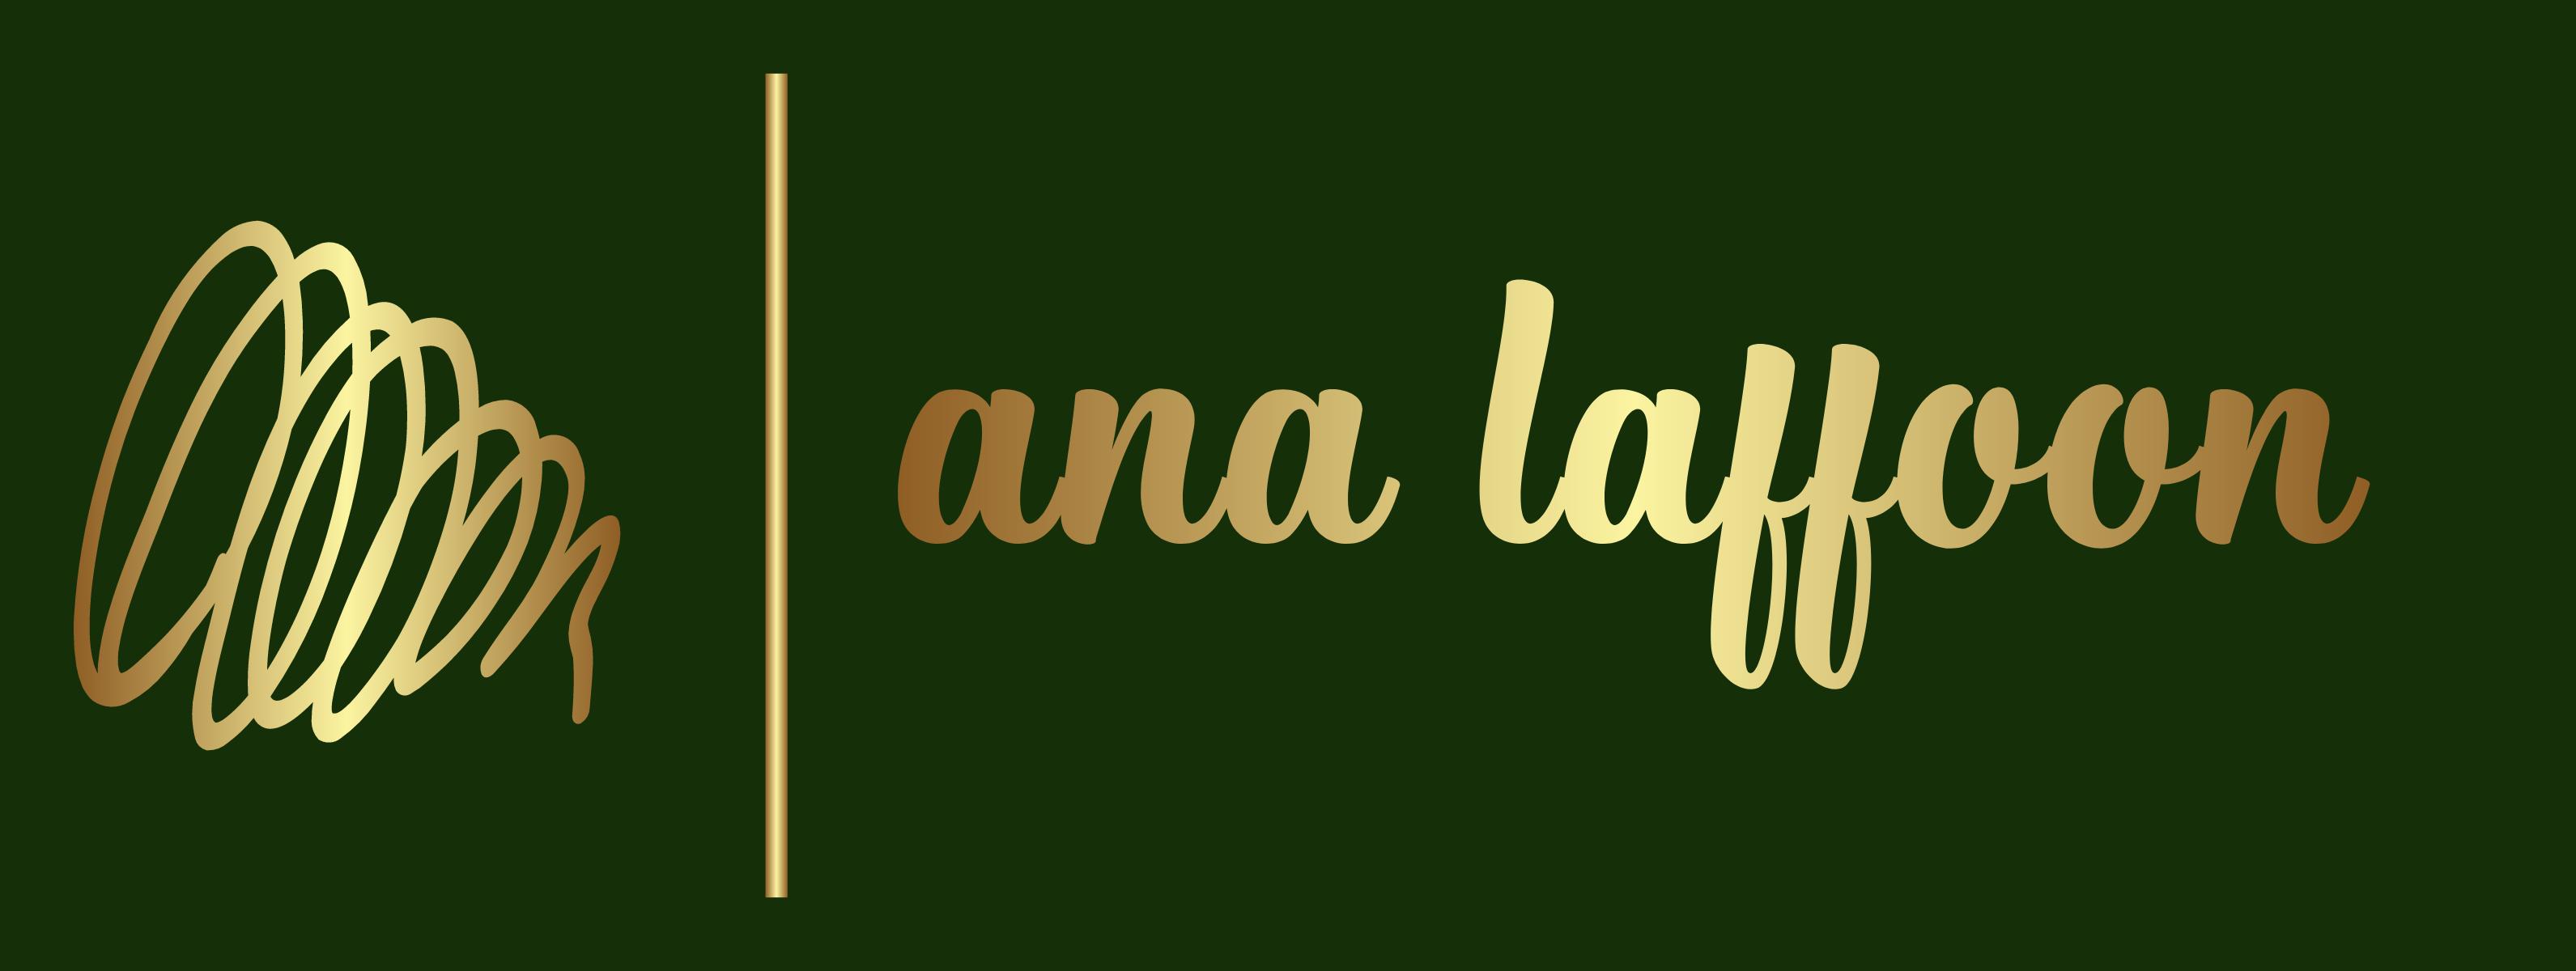 Ana Laffoon